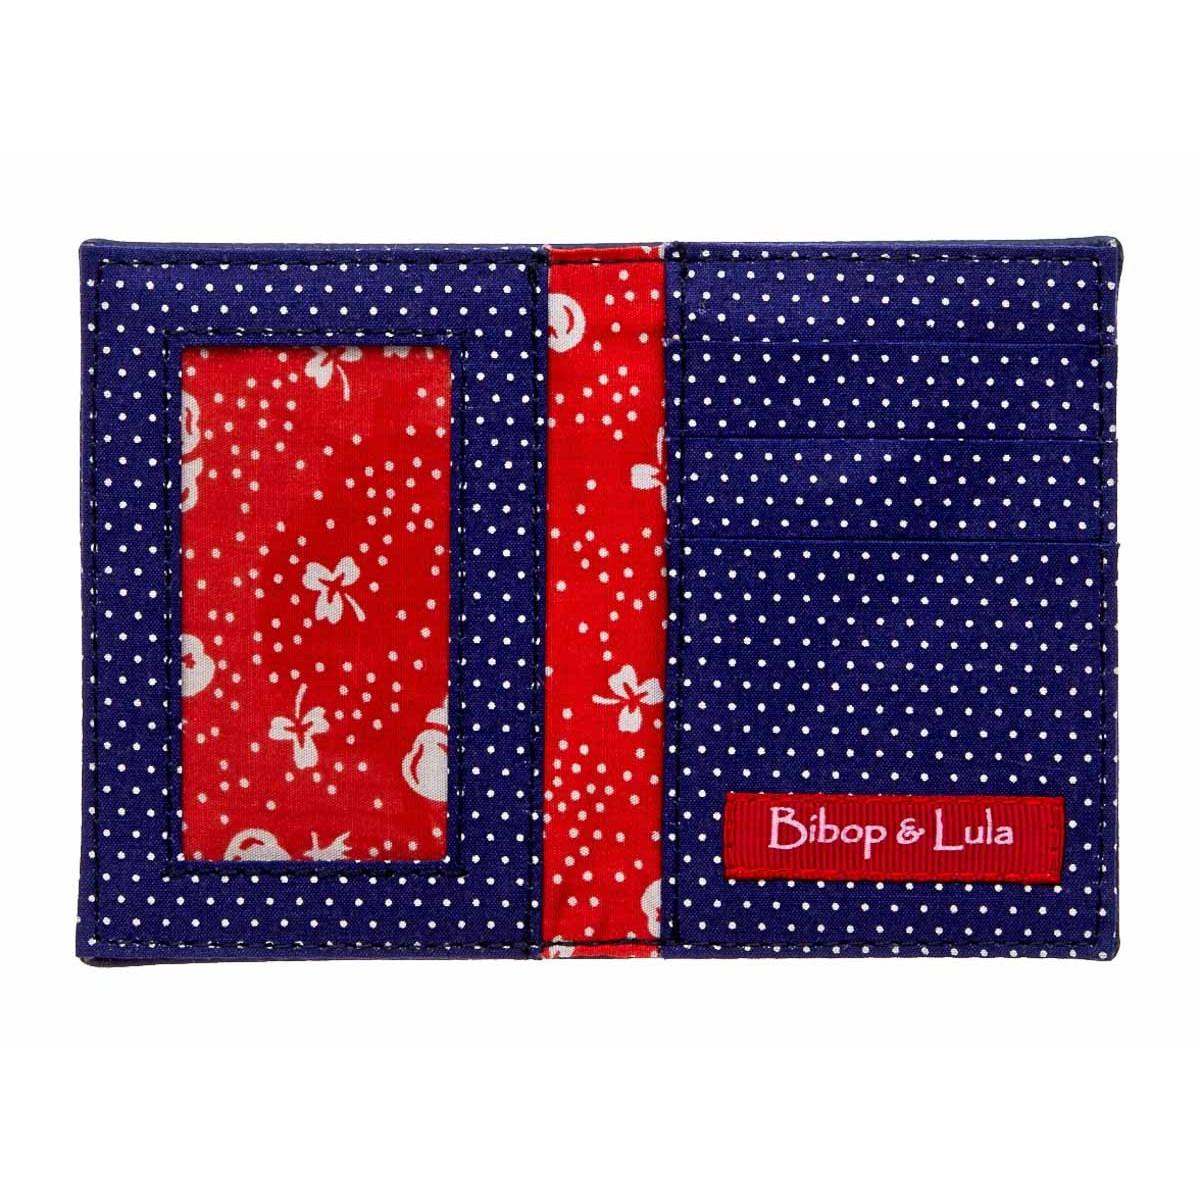 Porte-cartes femme original fantaisie rouge et bleu